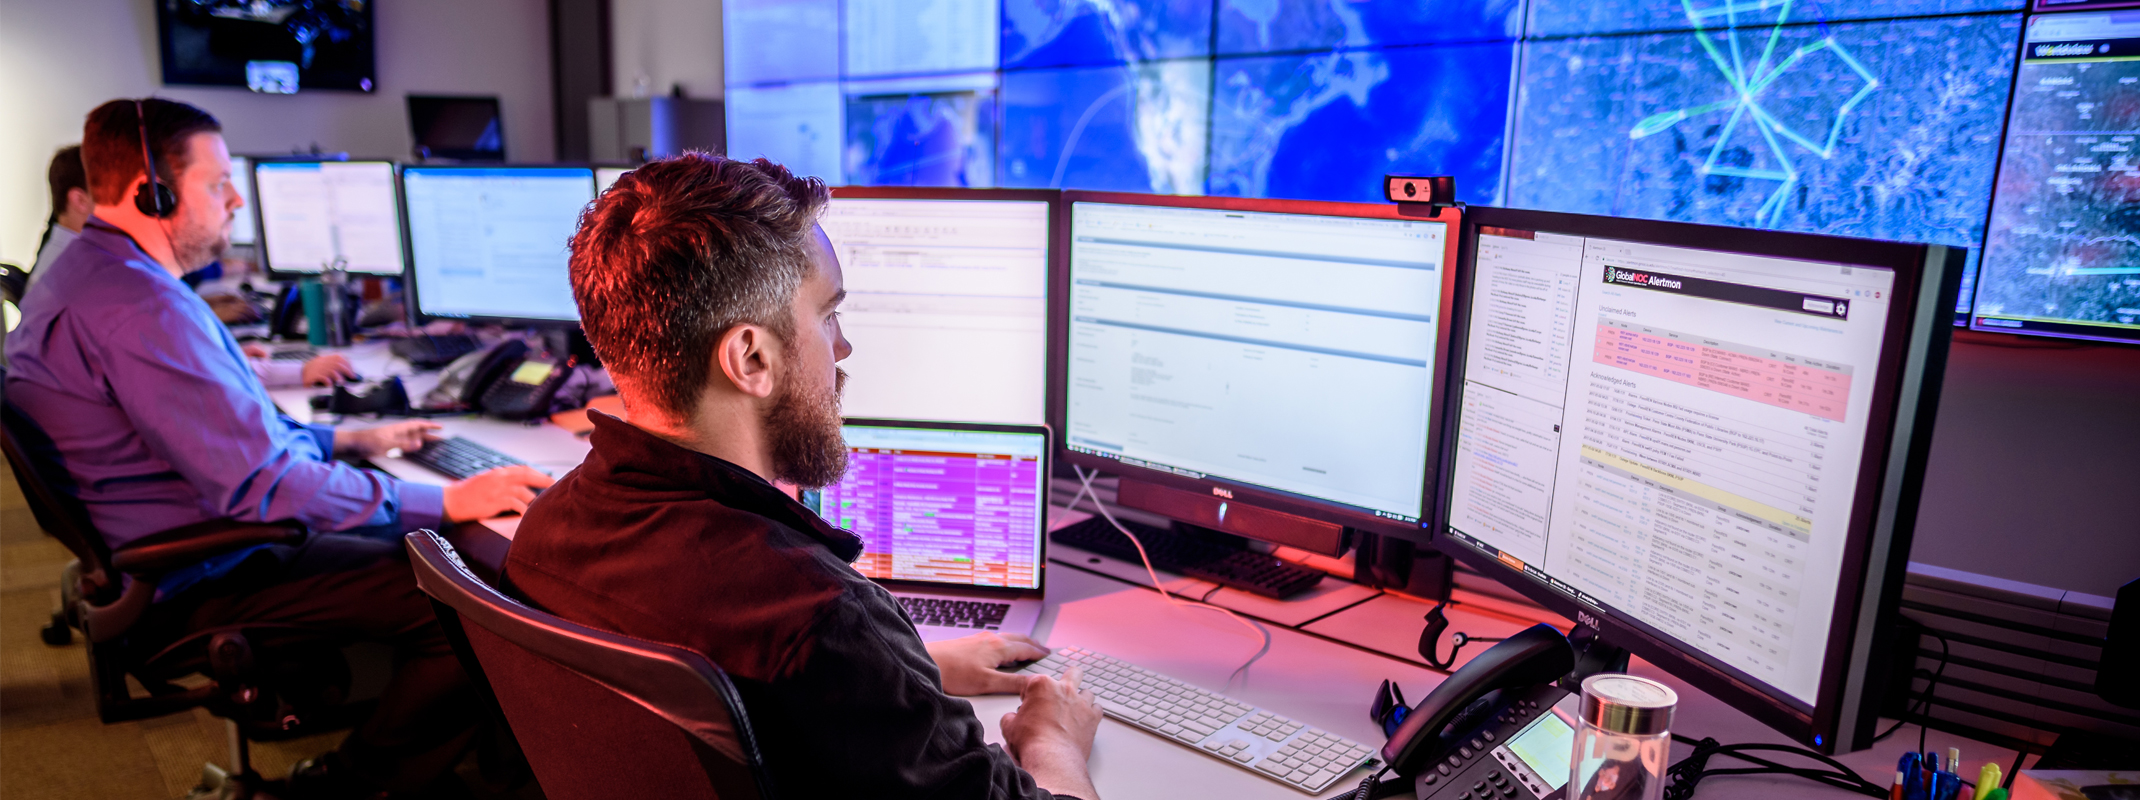 cyberopscenter.jpg